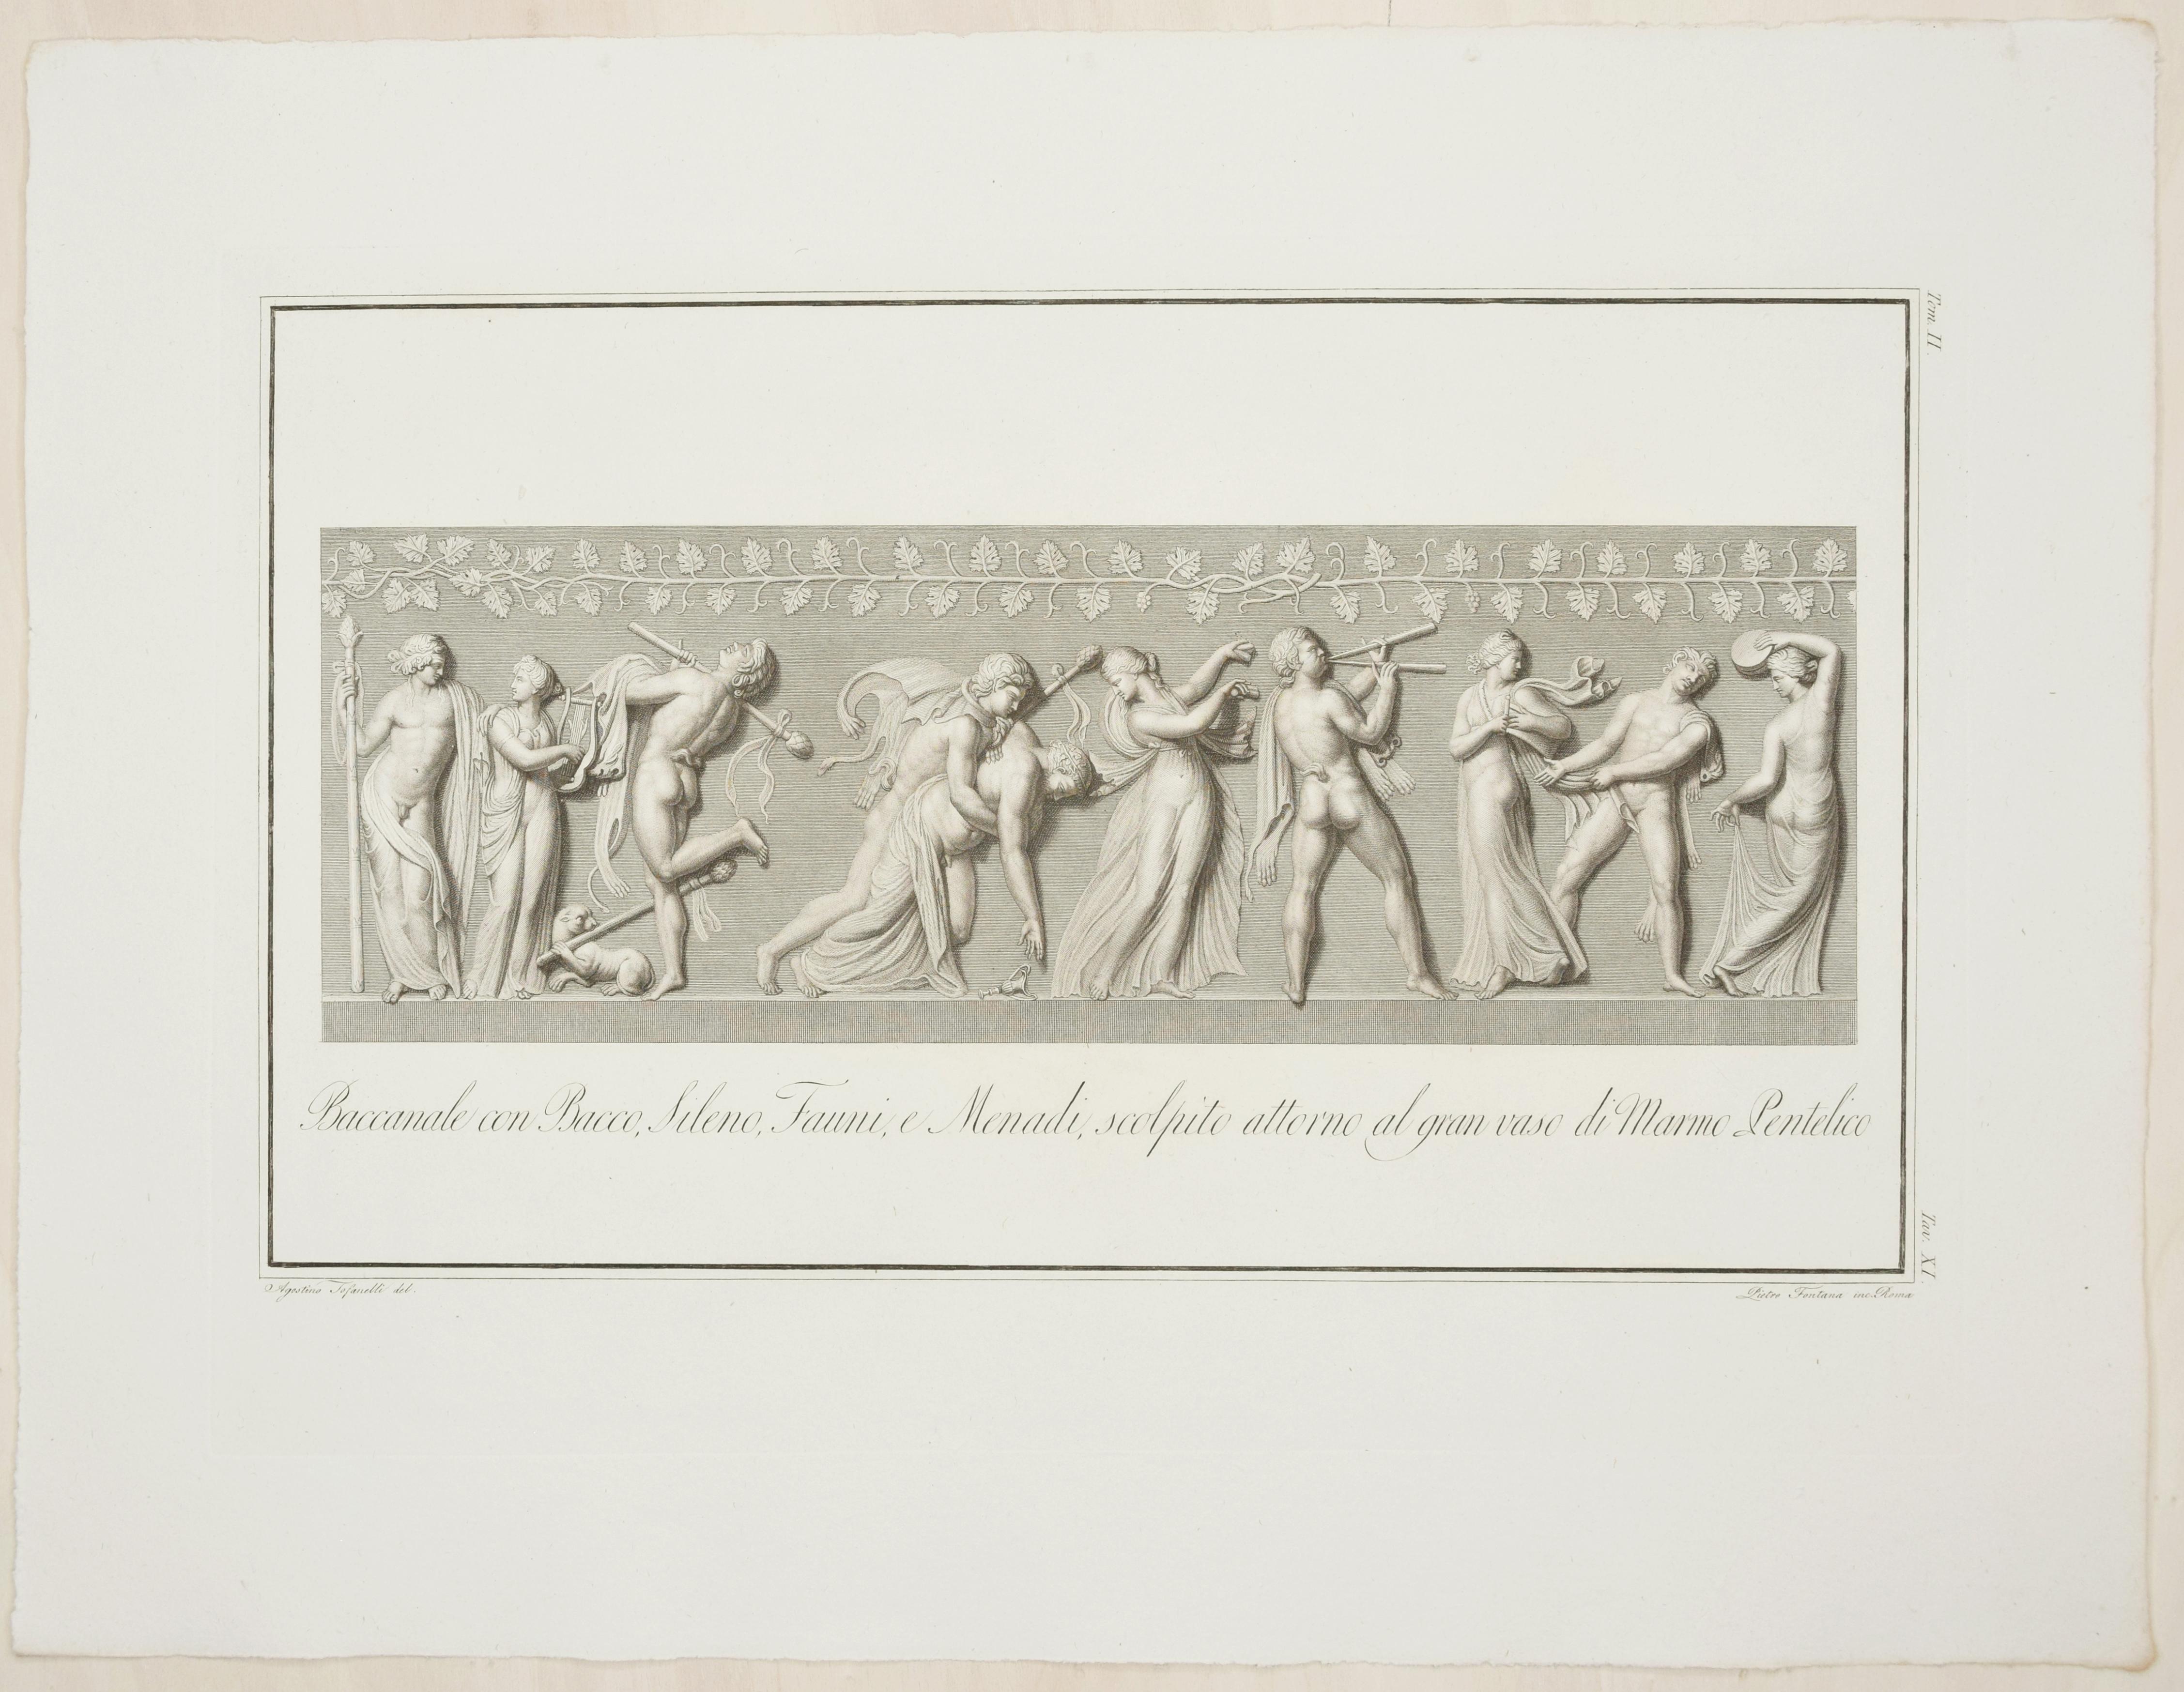 Bacchanalia - Original Etching by P. Fontana After A. Tofanelli - 1821